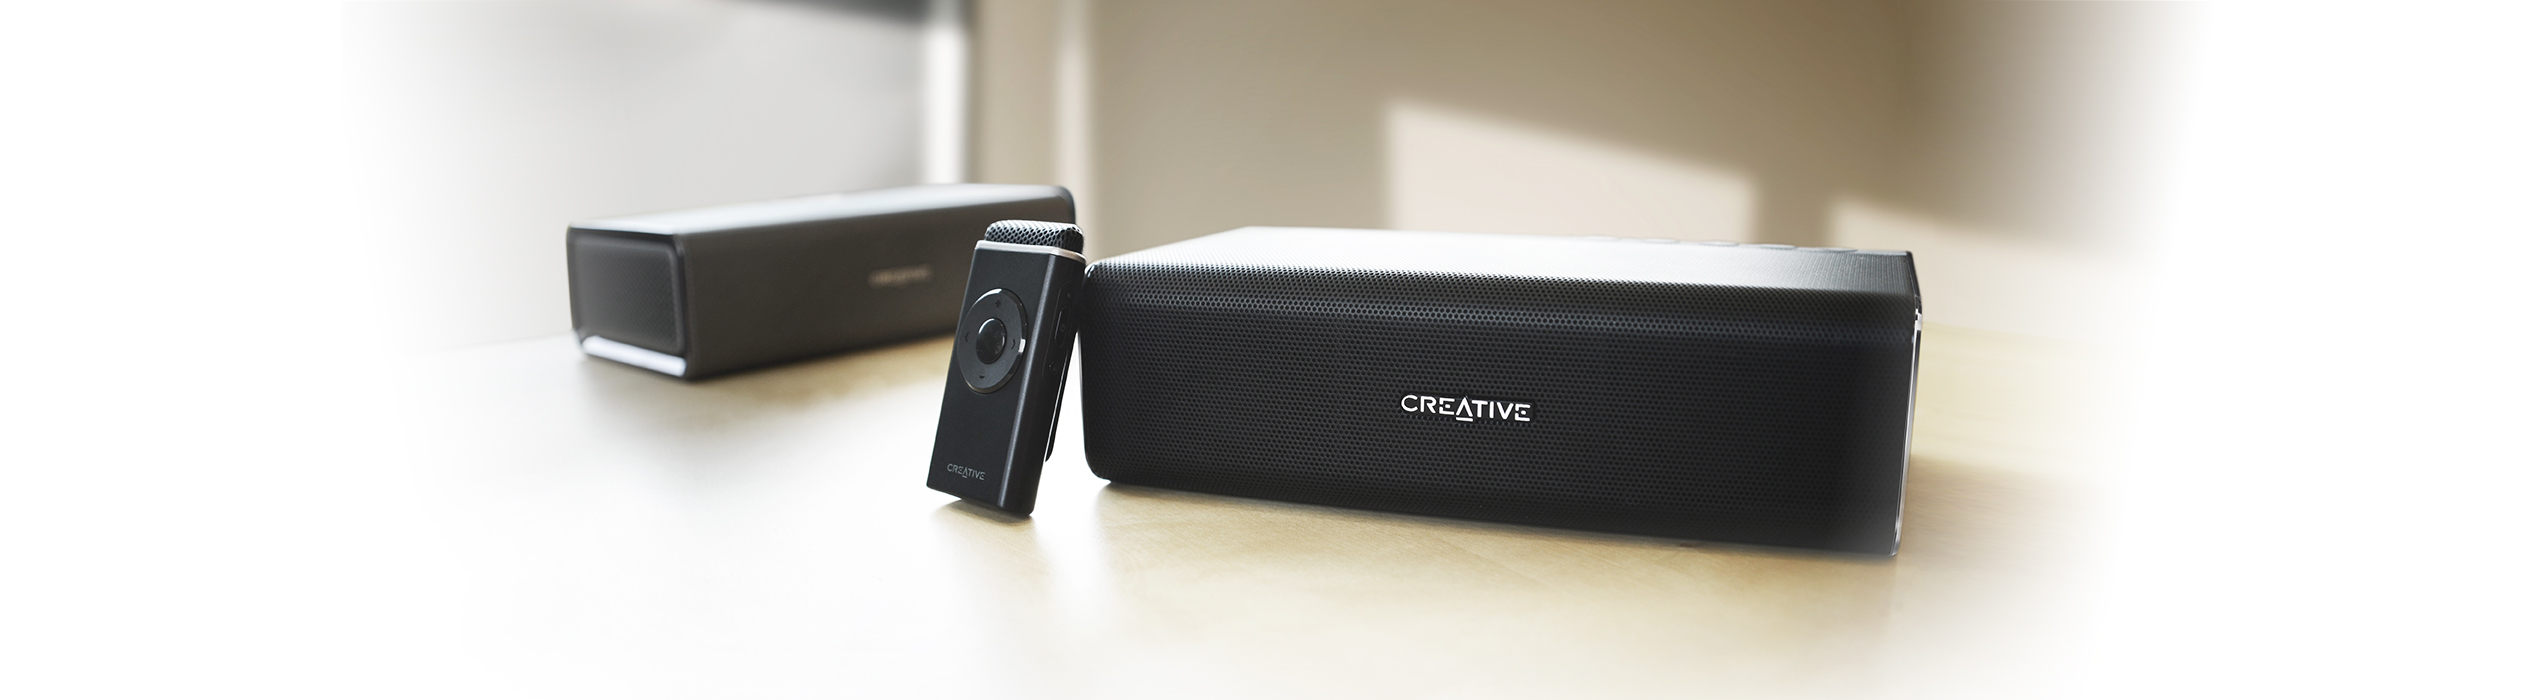 sound blaster roar pro puissante enceinte portable. Black Bedroom Furniture Sets. Home Design Ideas